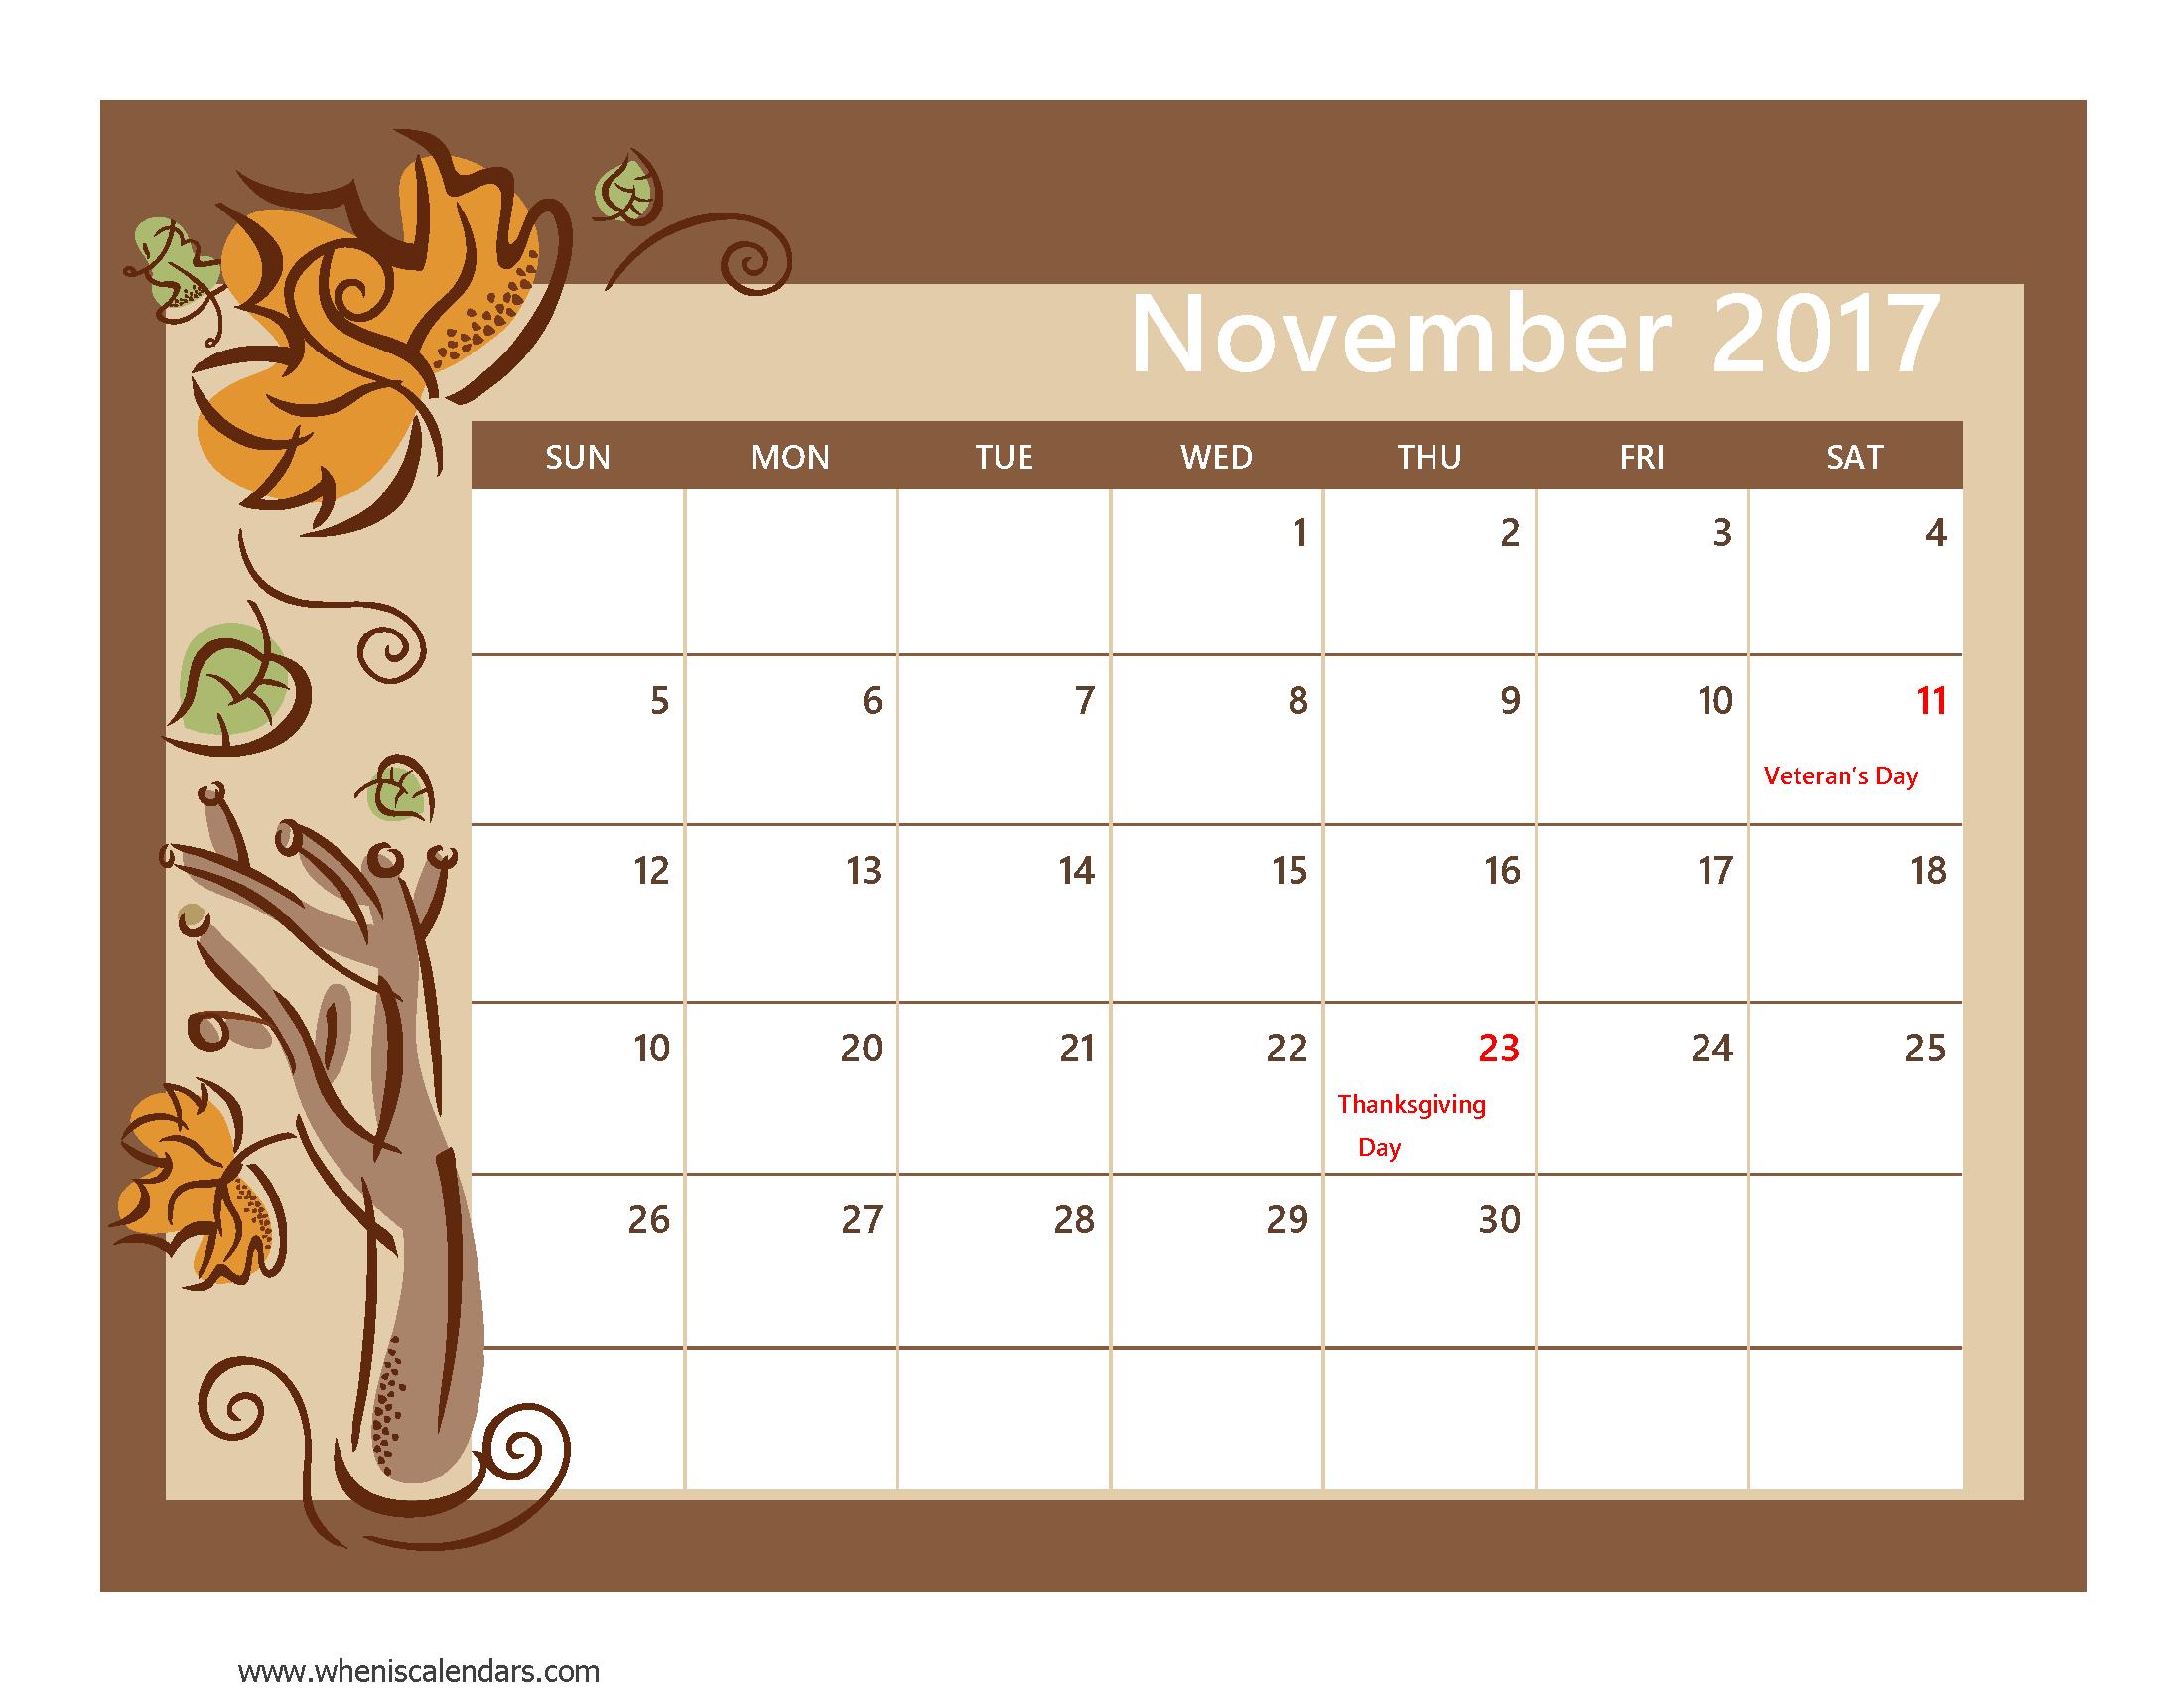 November 2017 Calendar Pdf | weekly calendar template